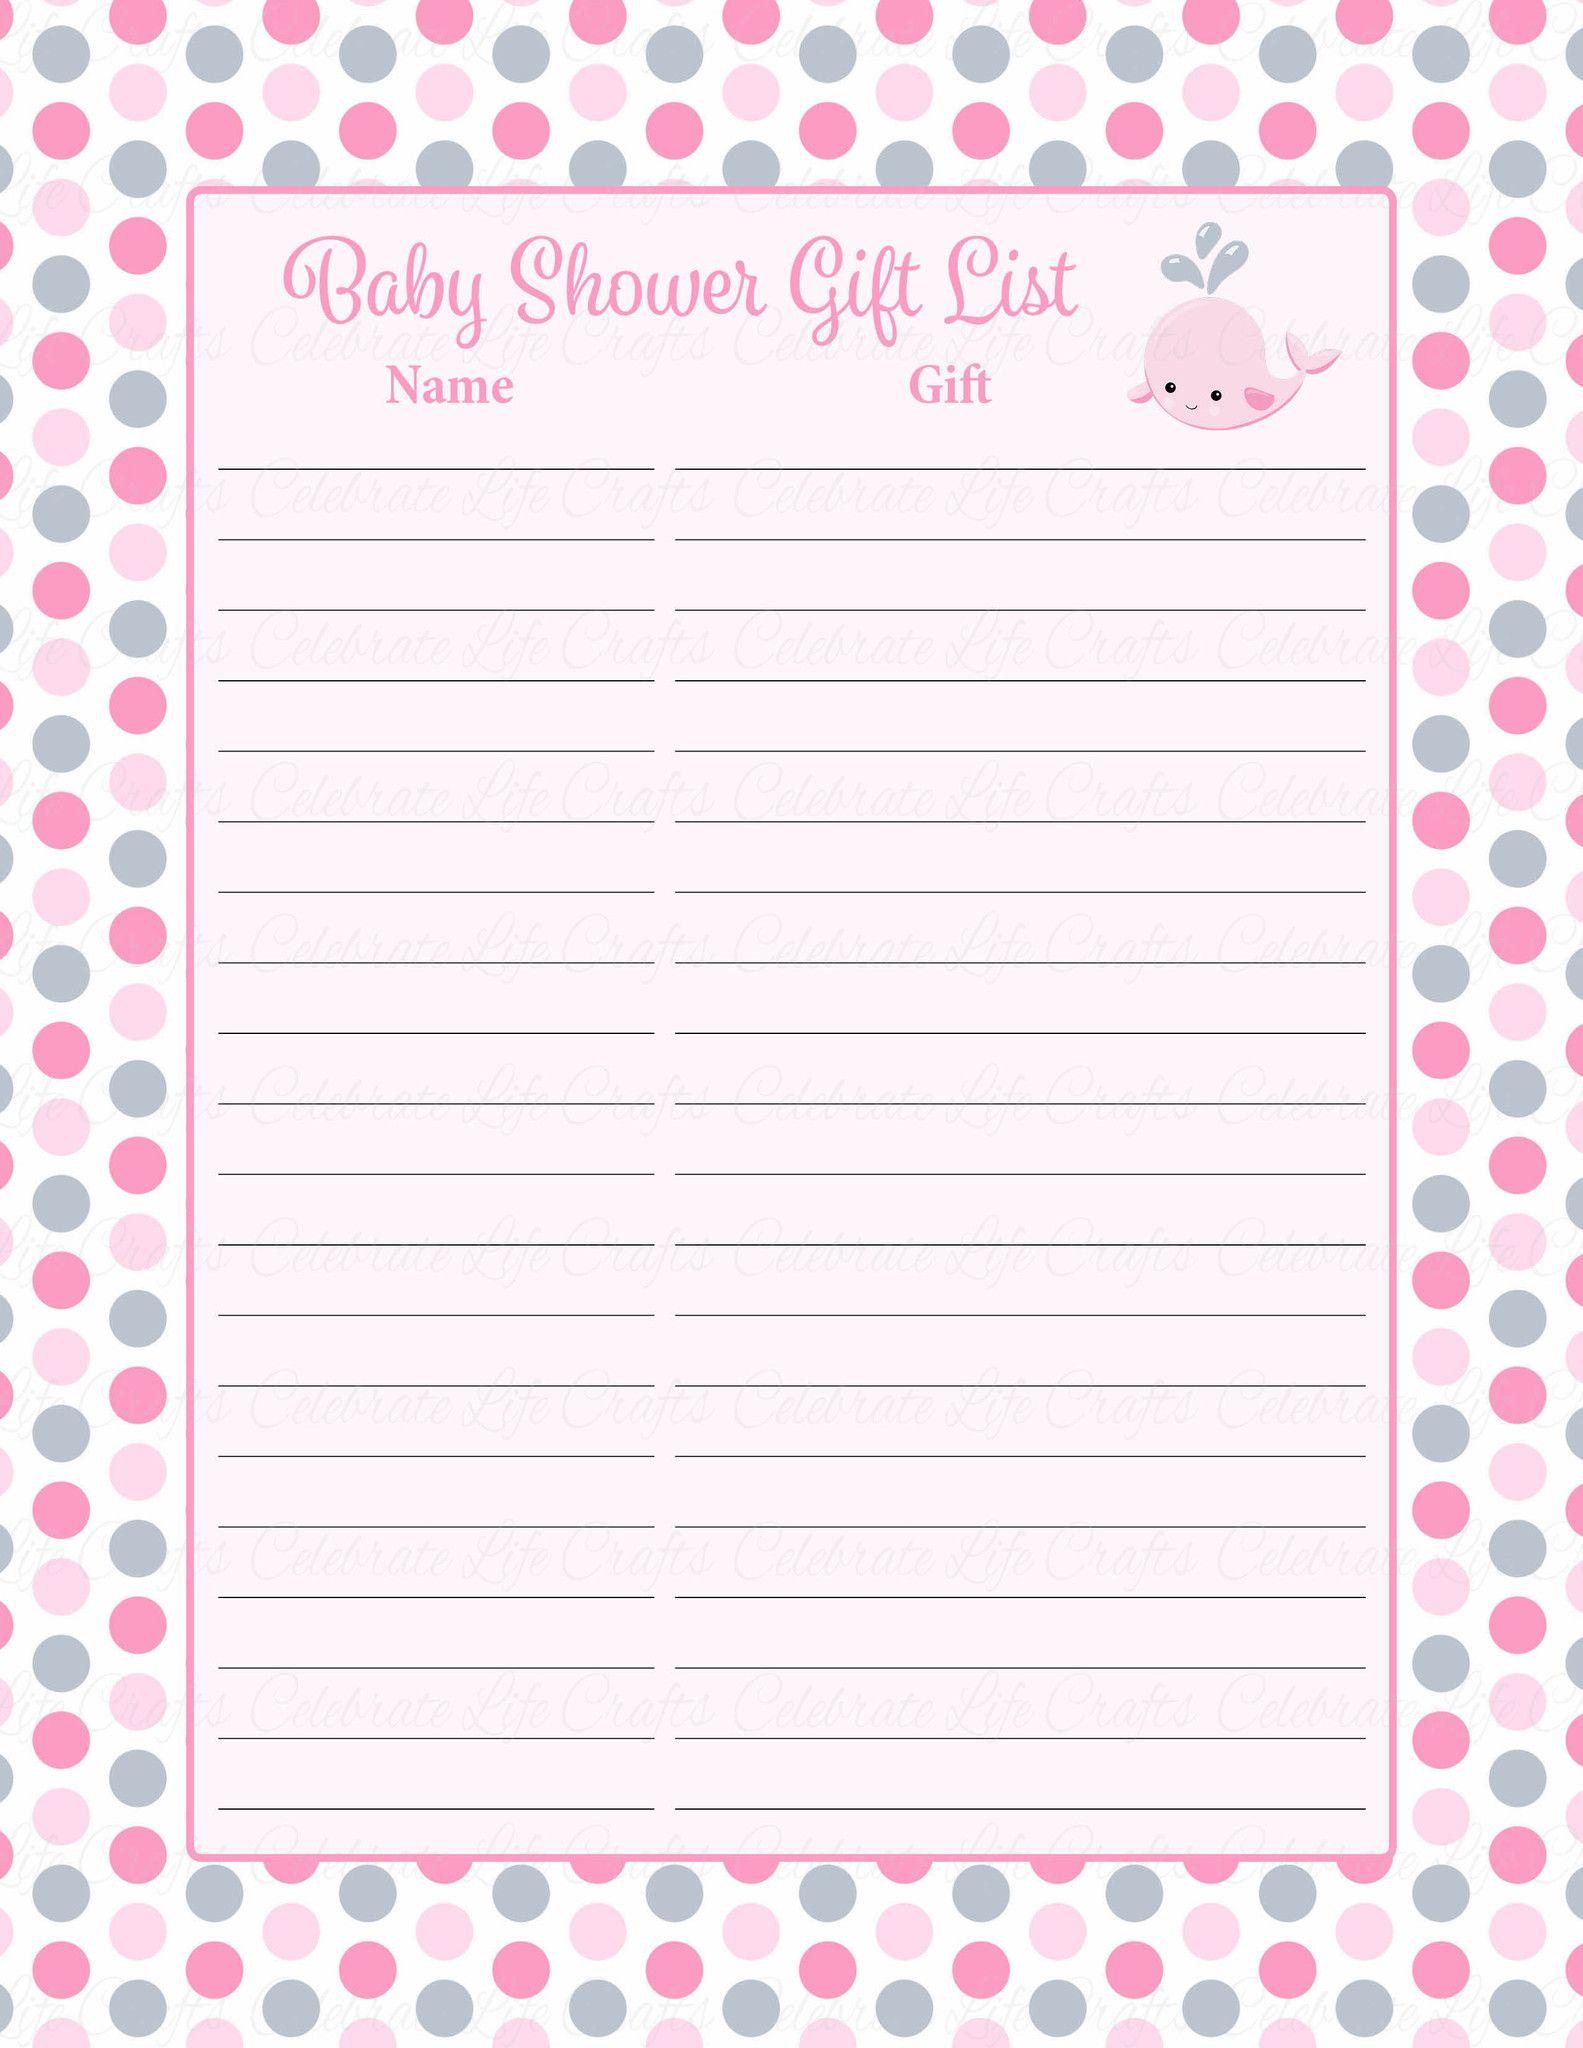 image regarding Printable Baby Shower Gift List titled Child Shower Reward Record Fastened - Printable Obtain - Crimson Grey